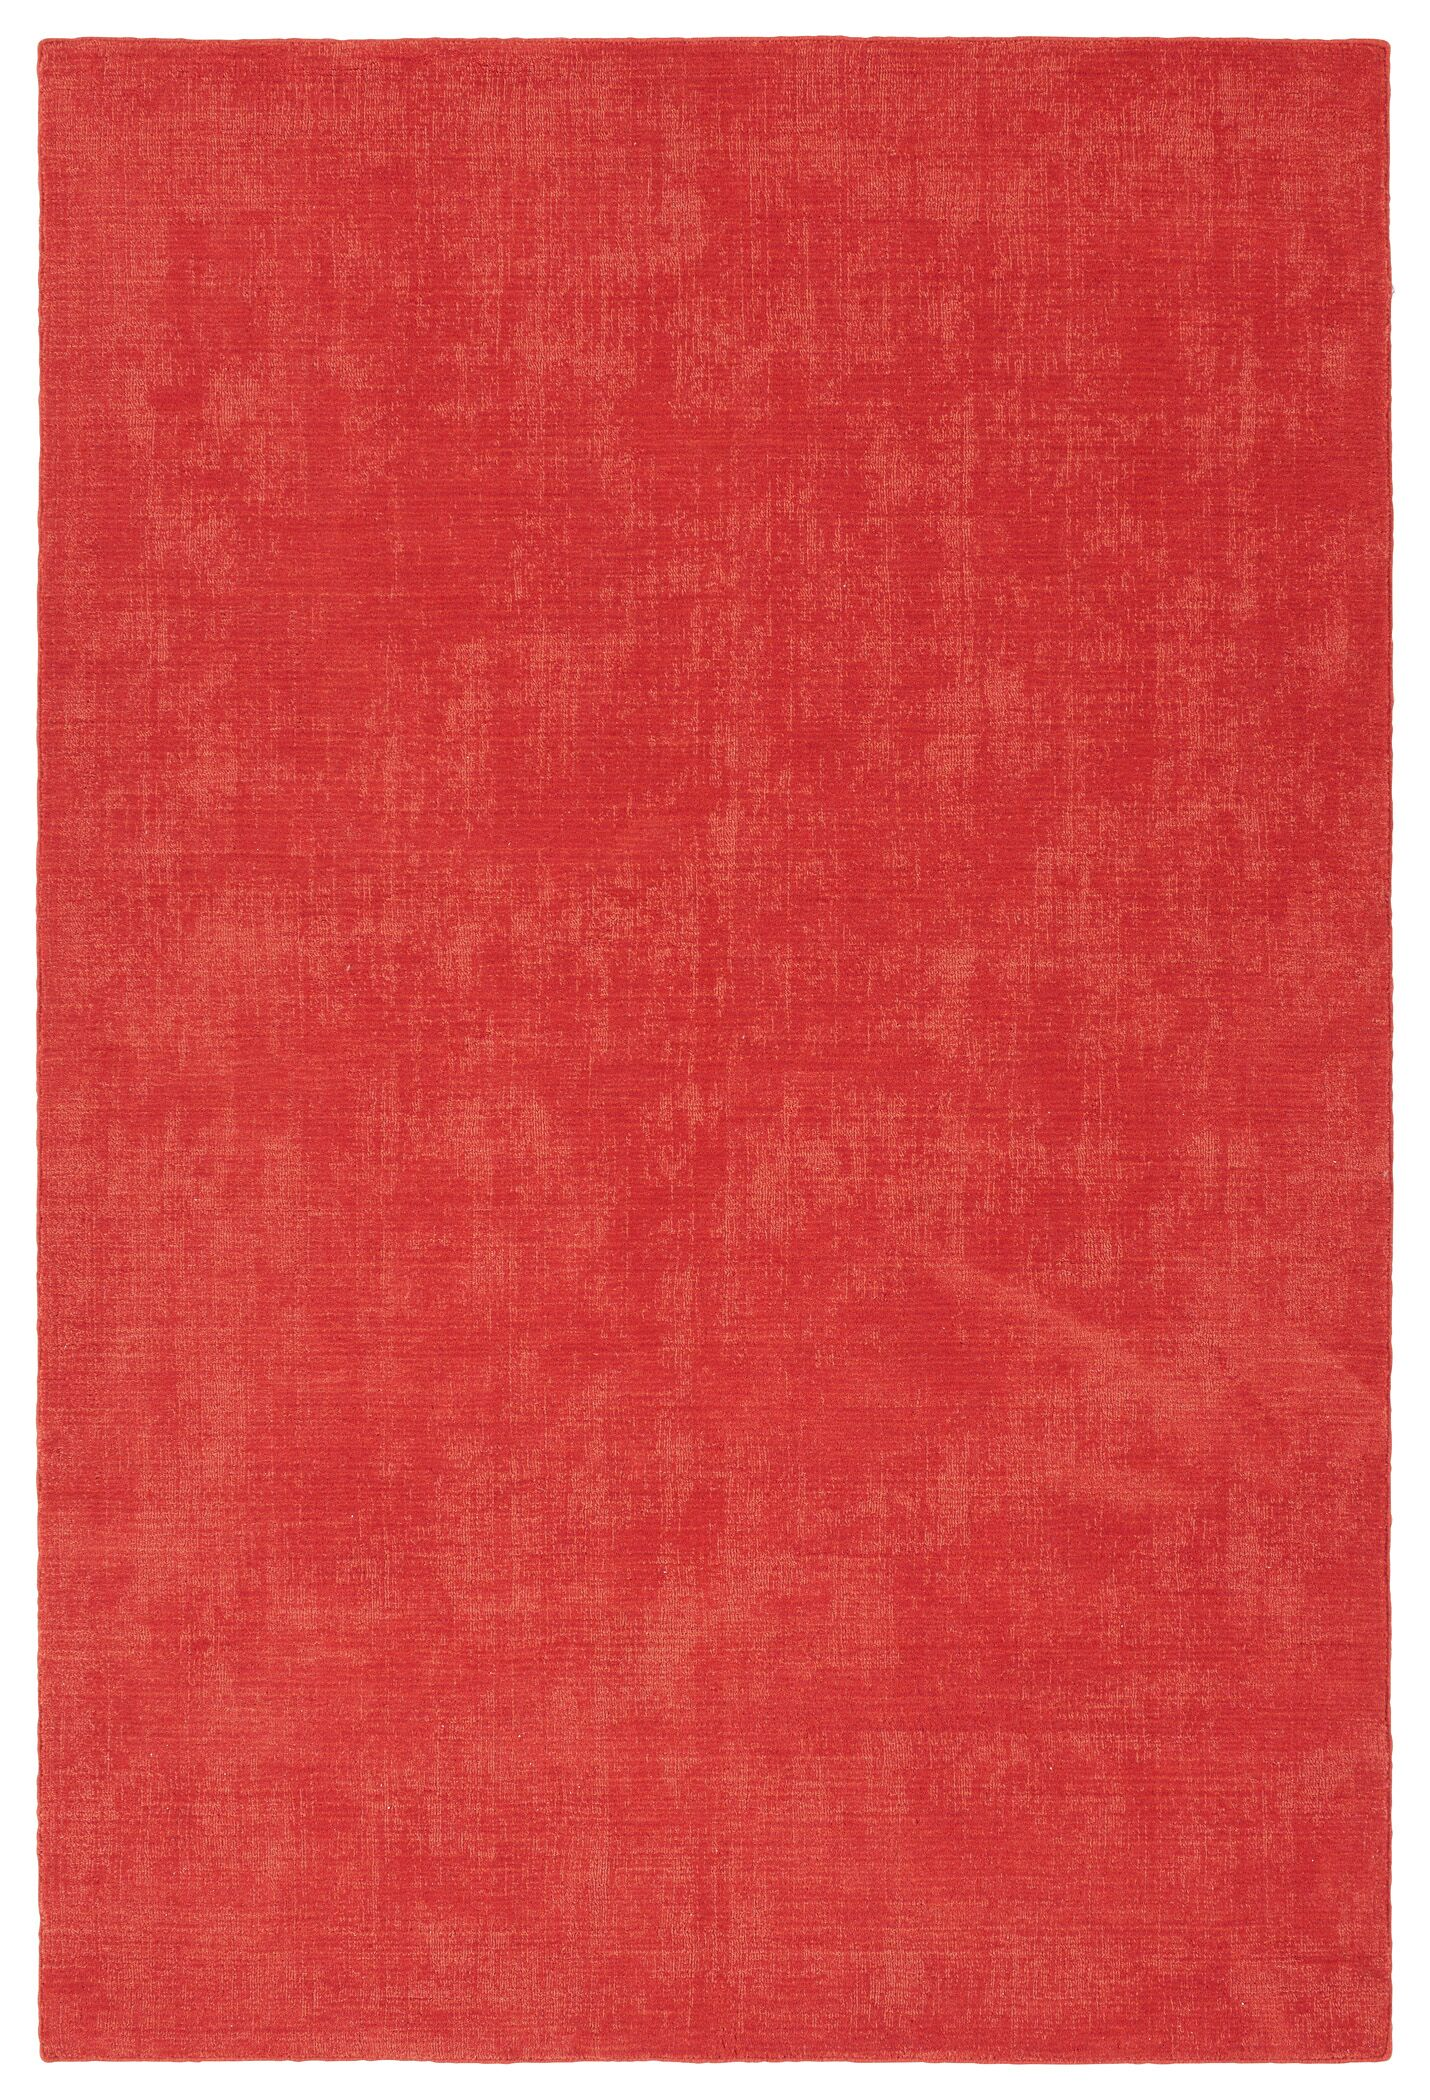 Allibert Hand-Loomed Pink Indoor/Outdoor Area Rug Rug Size: Rectangle 5' x 7'6